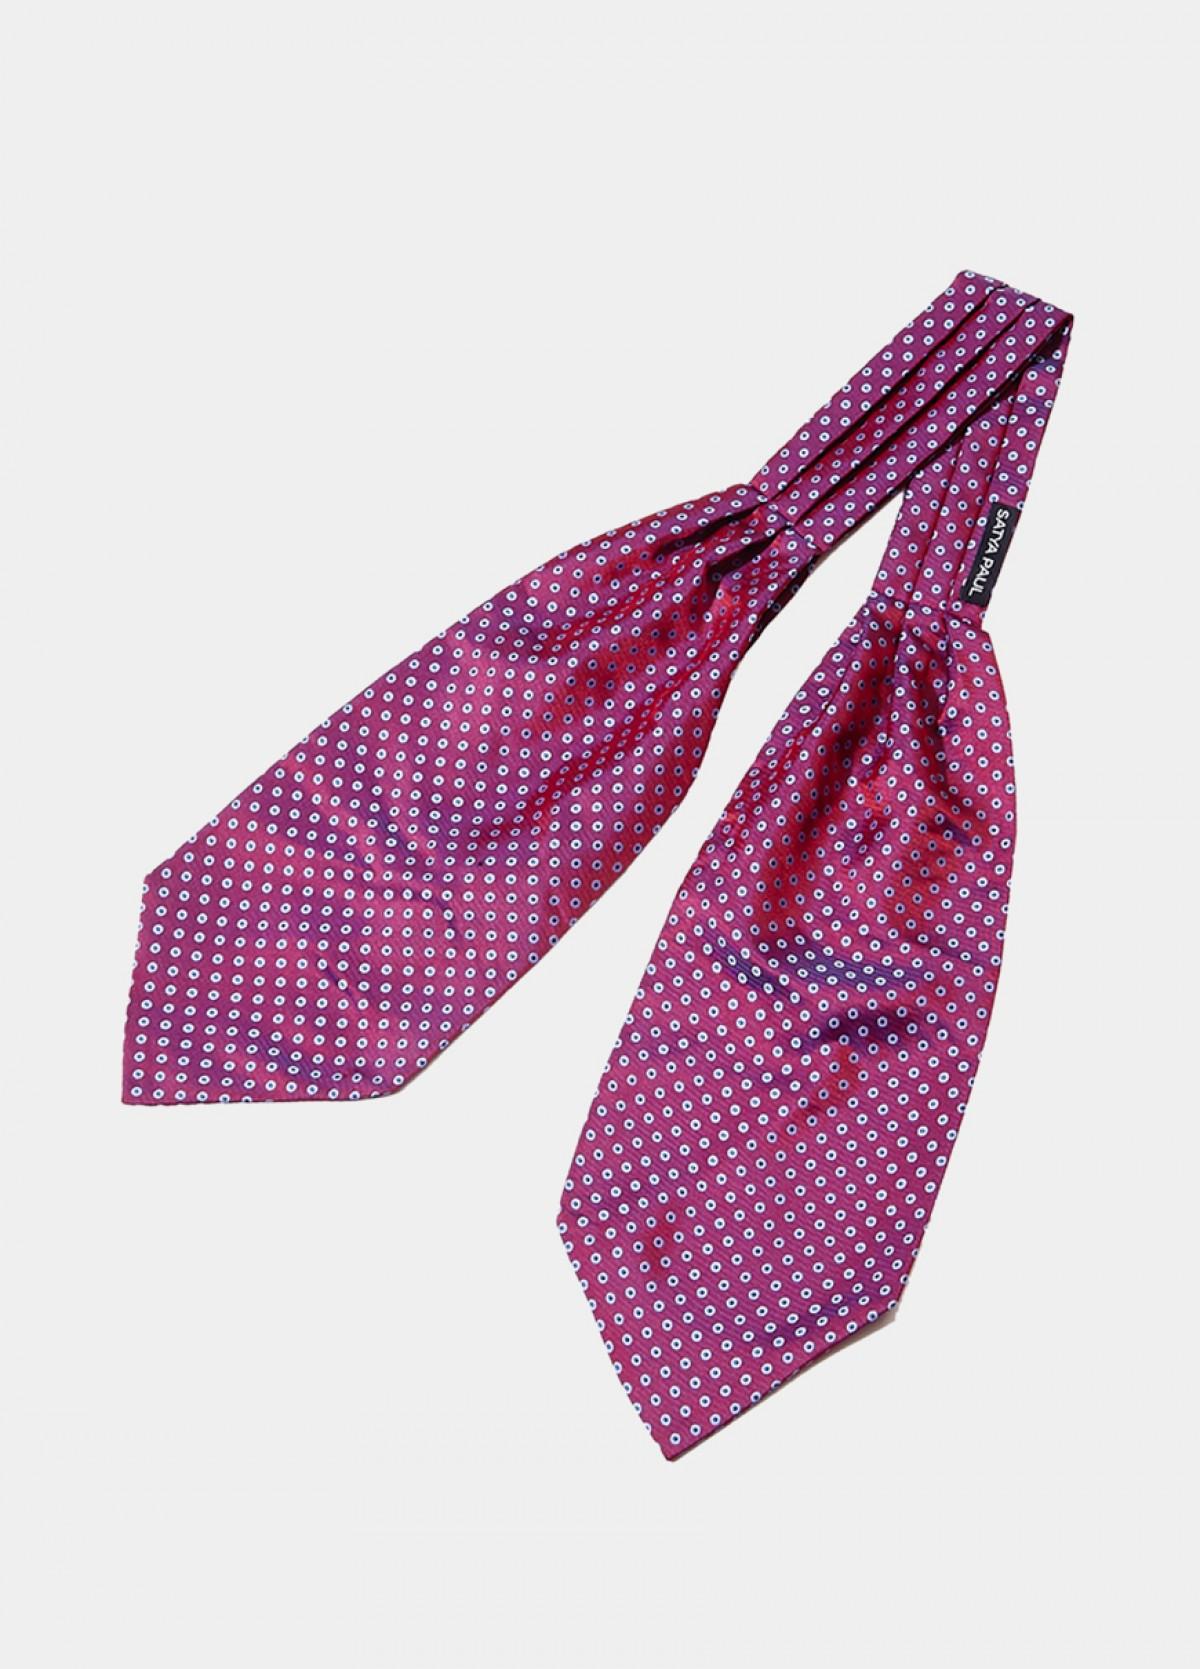 The Red Maroon Cravat